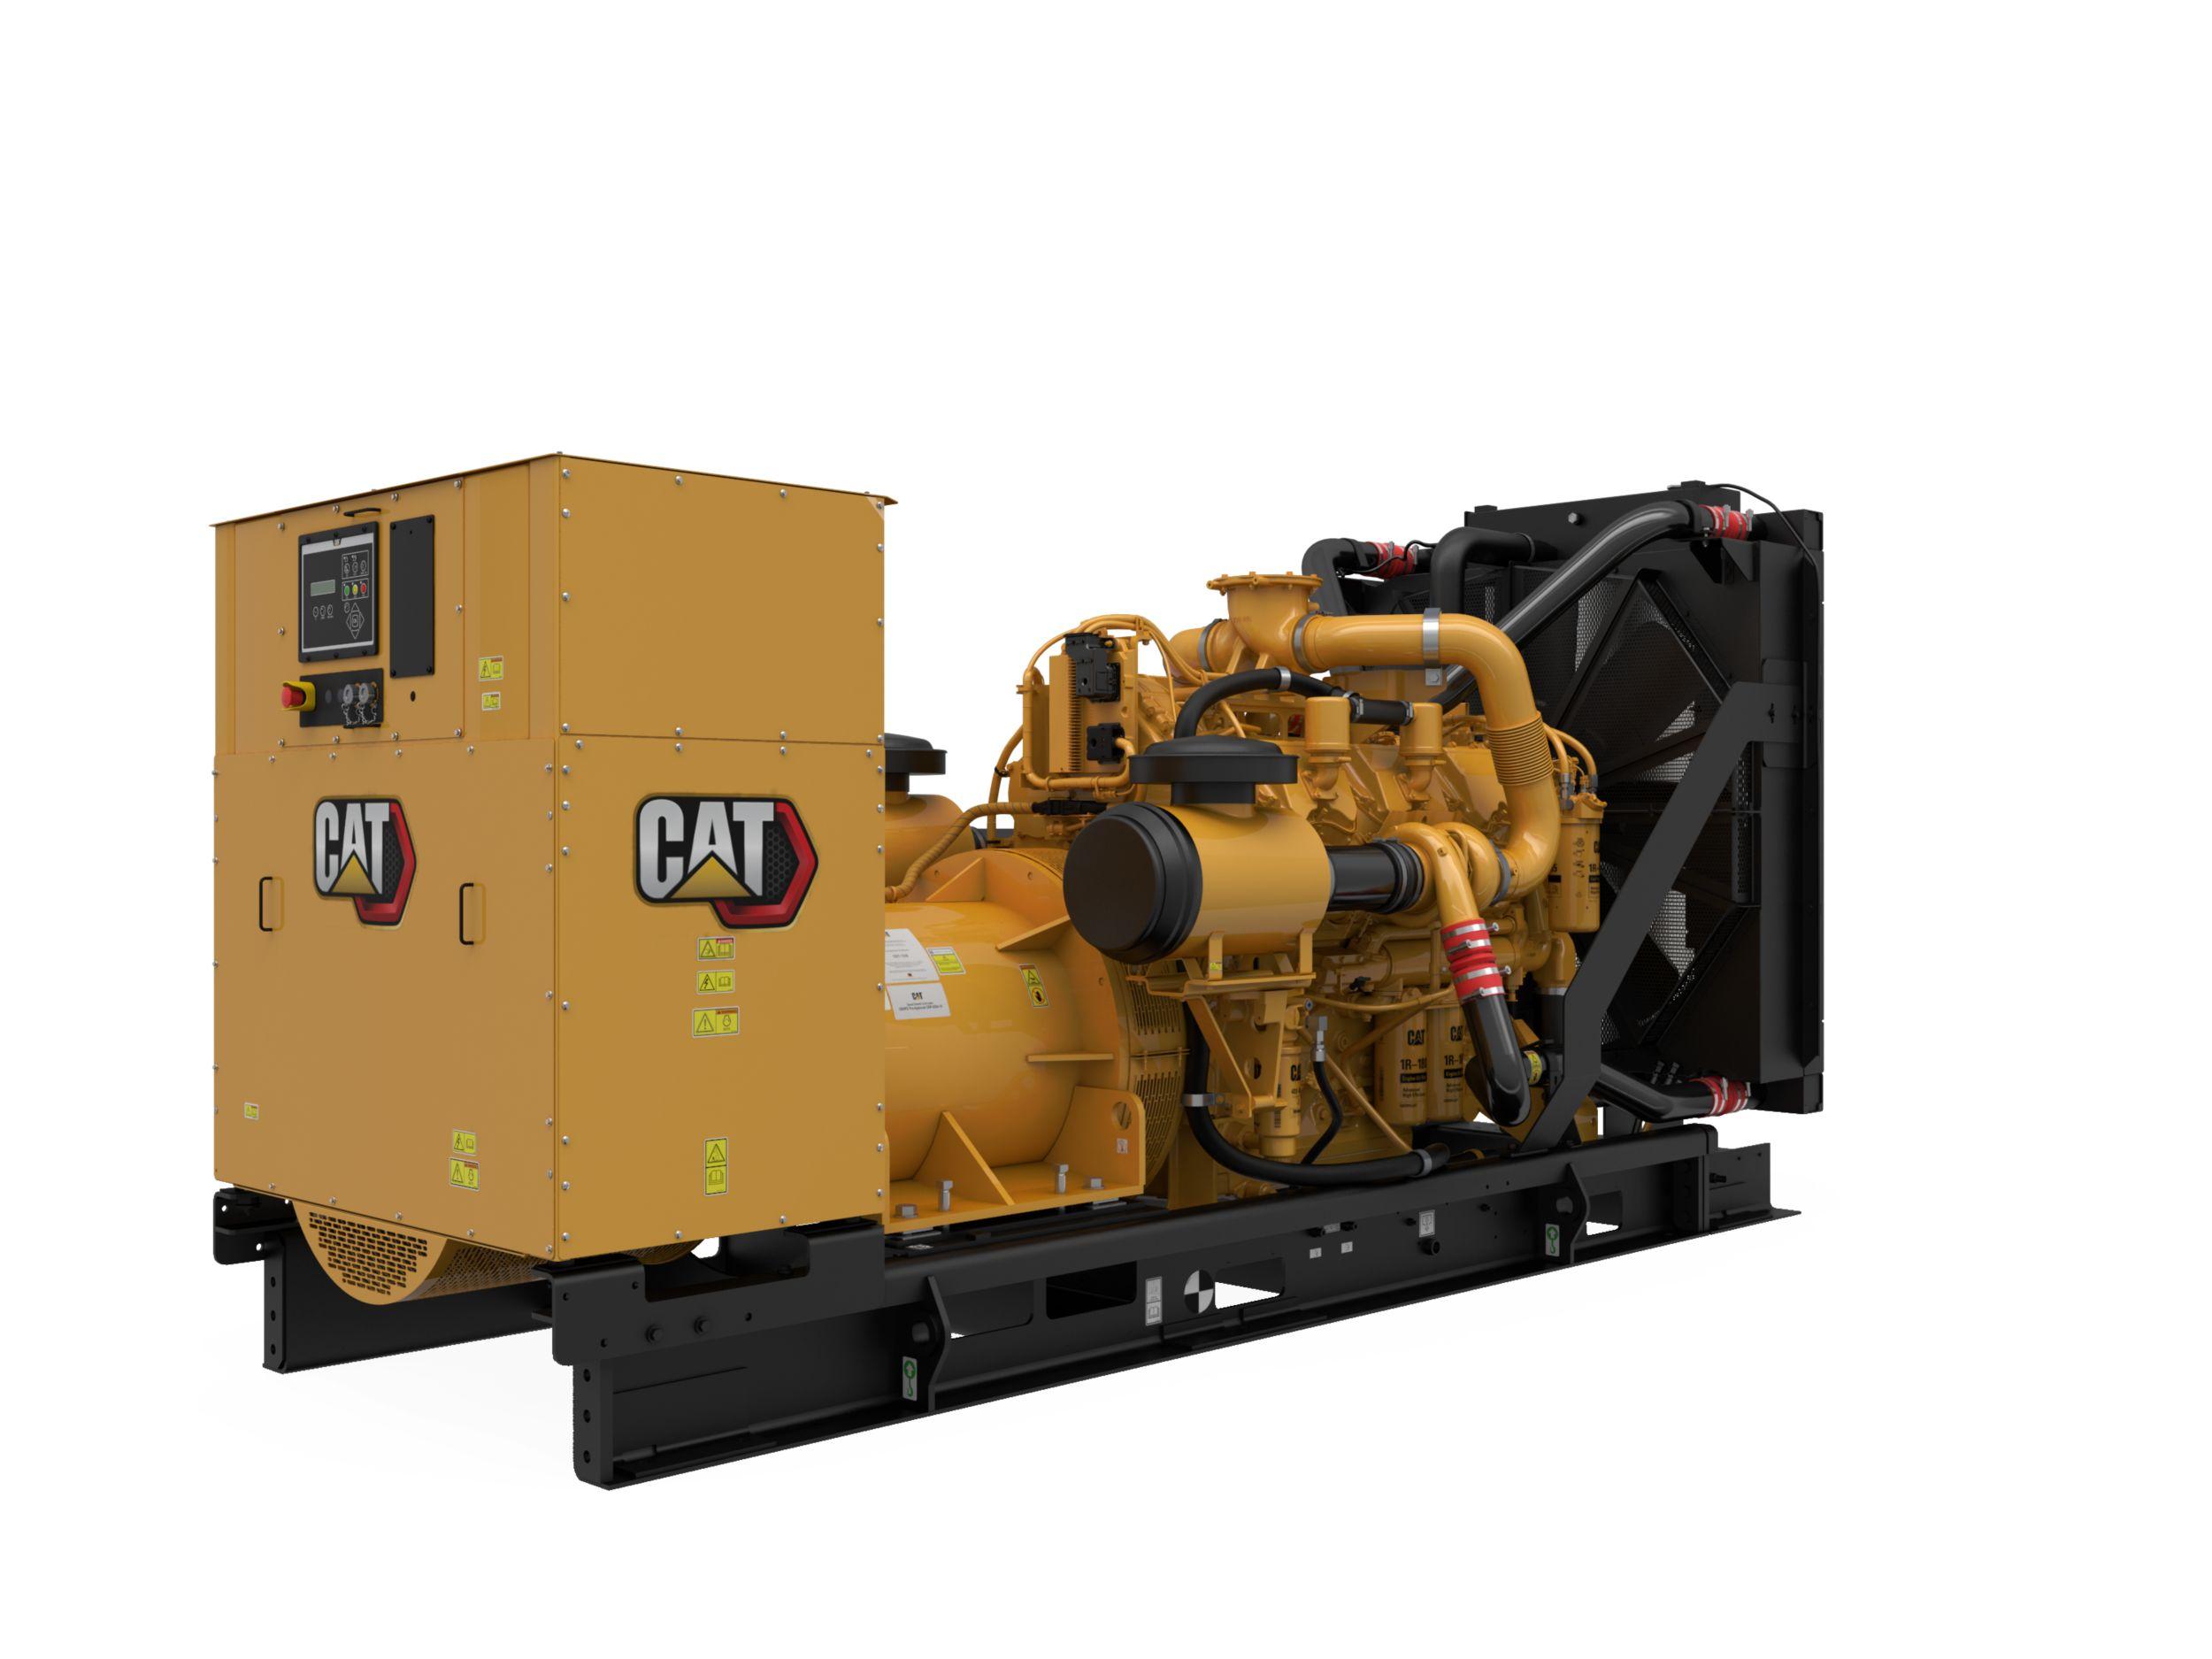 Cat | C27 (60 HZ) | 680800 kW Diesel Generator | Caterpillar